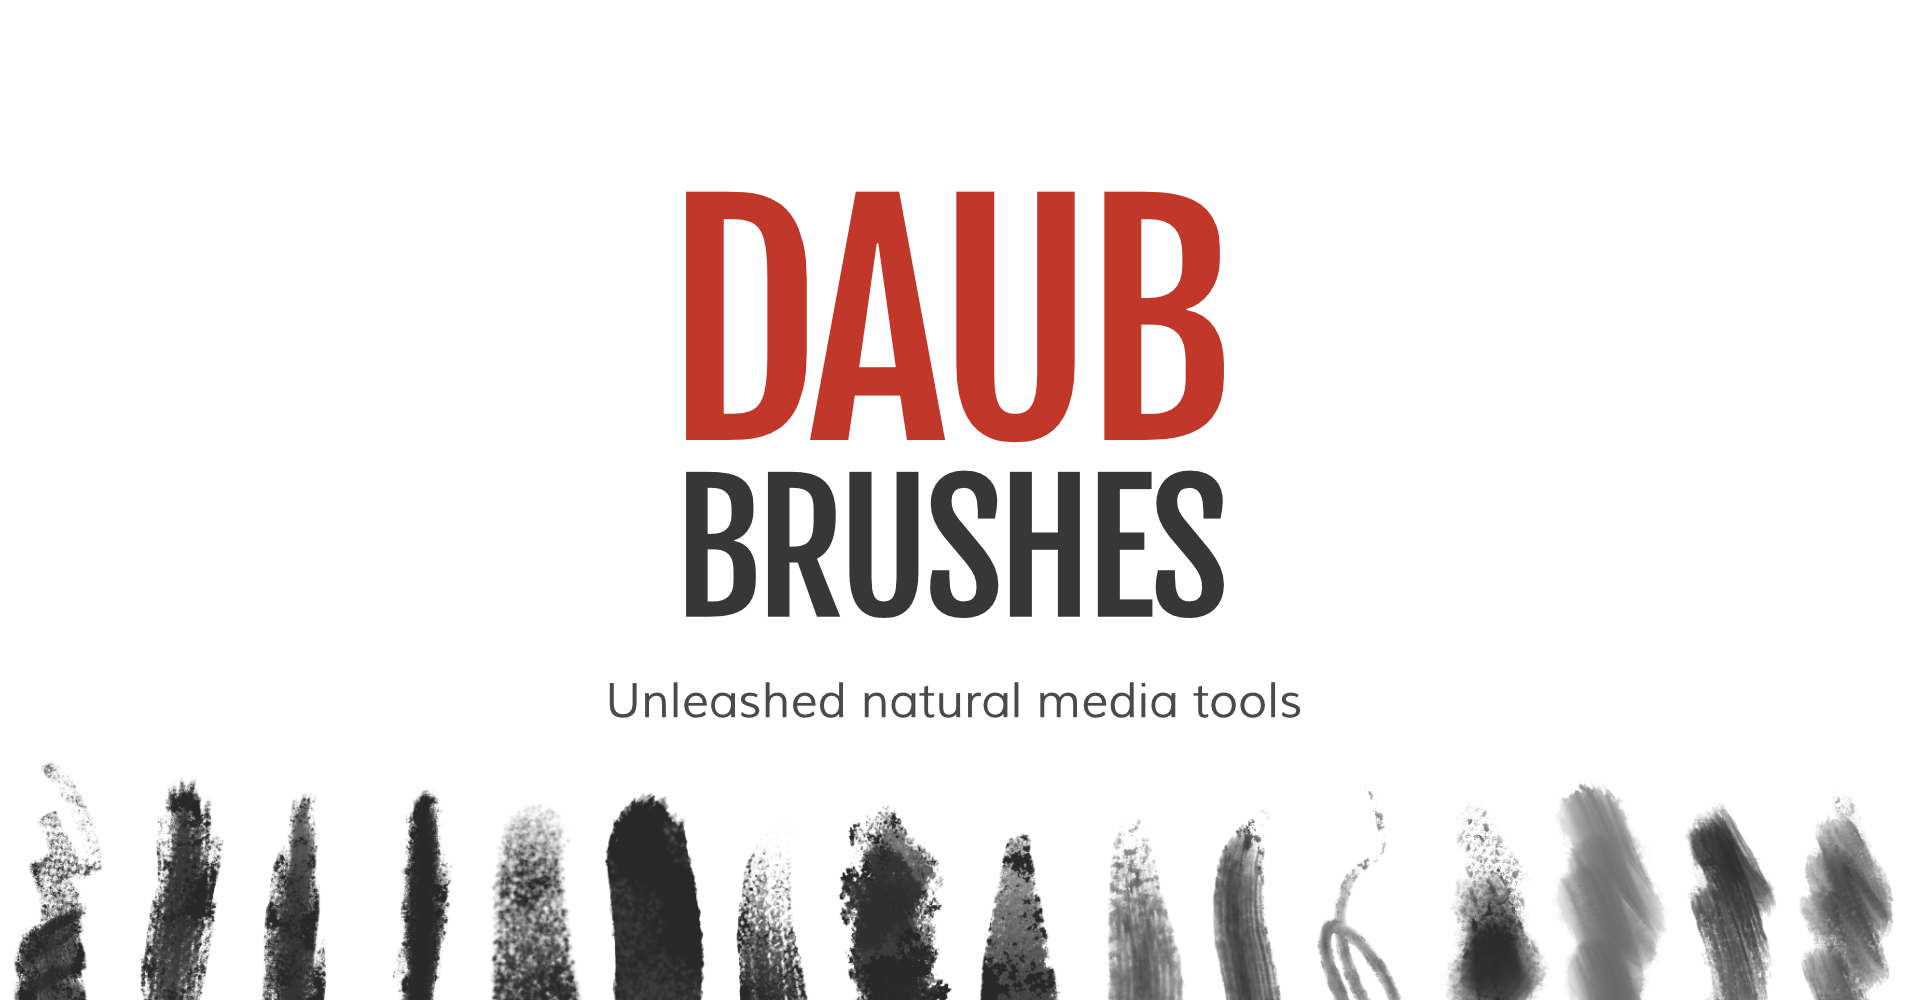 DAUB Brushes - Unleashed natural media tools